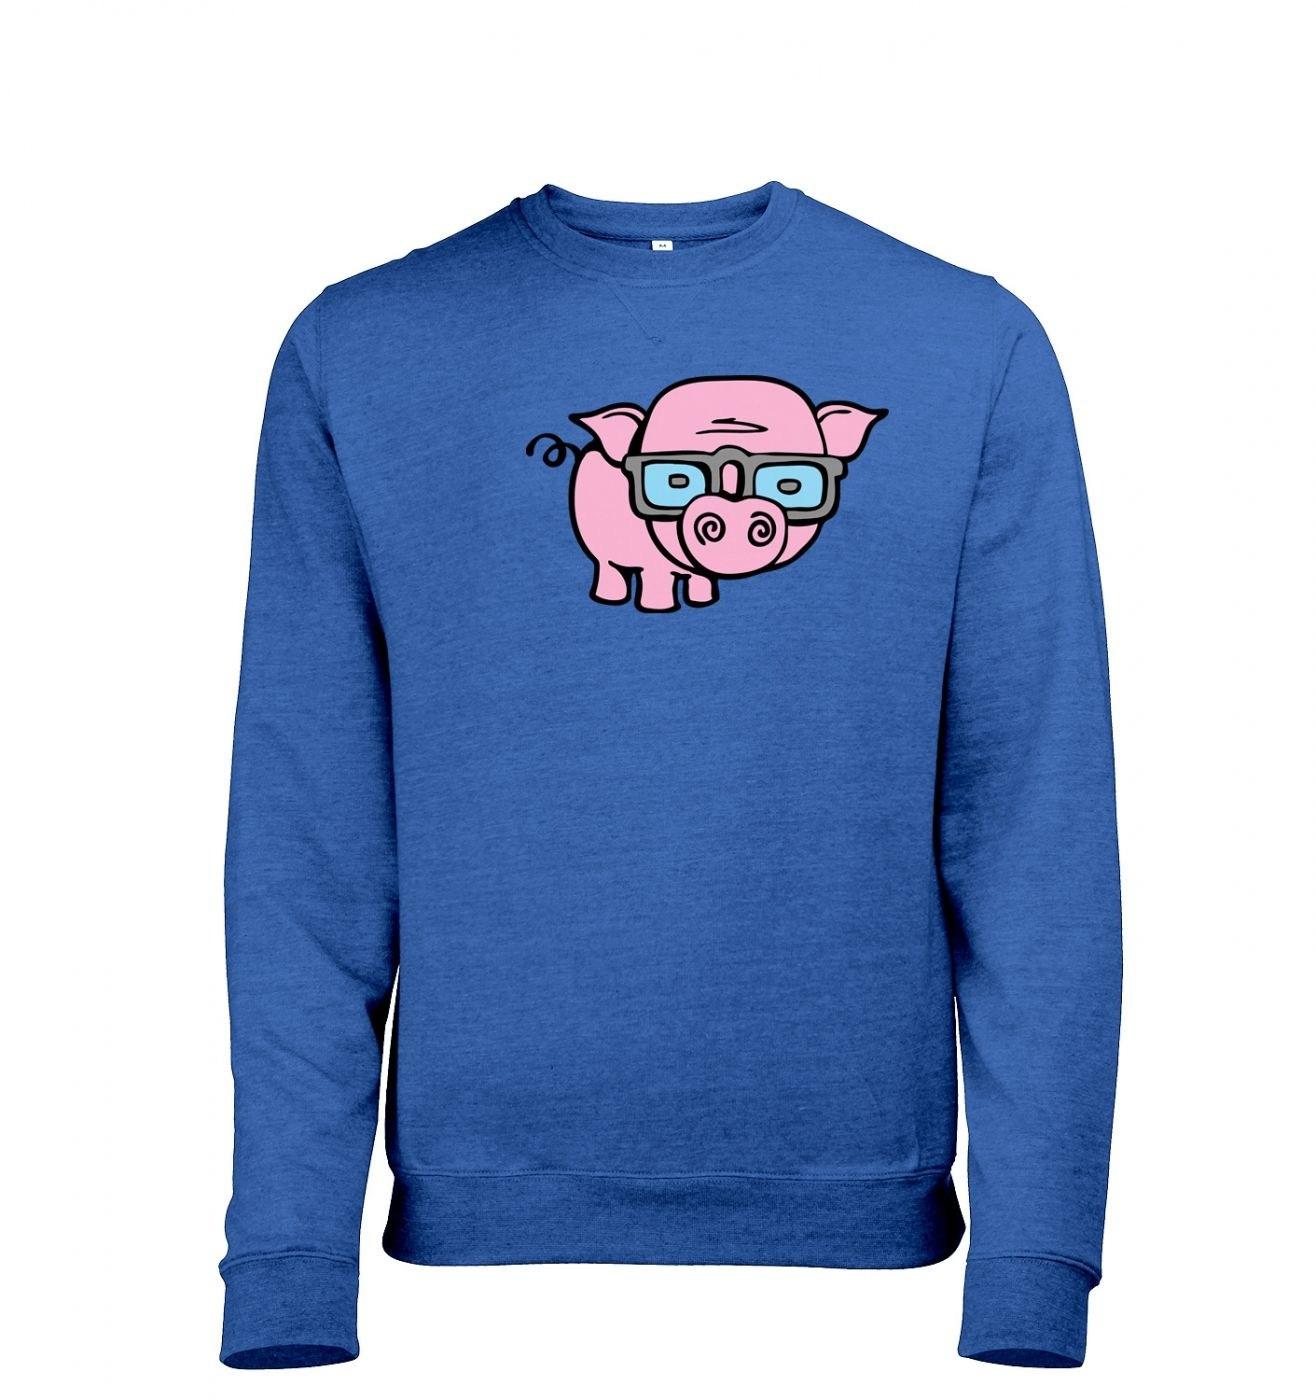 971aaa02 Geek Pig heather sweatshirt - Somethinggeeky